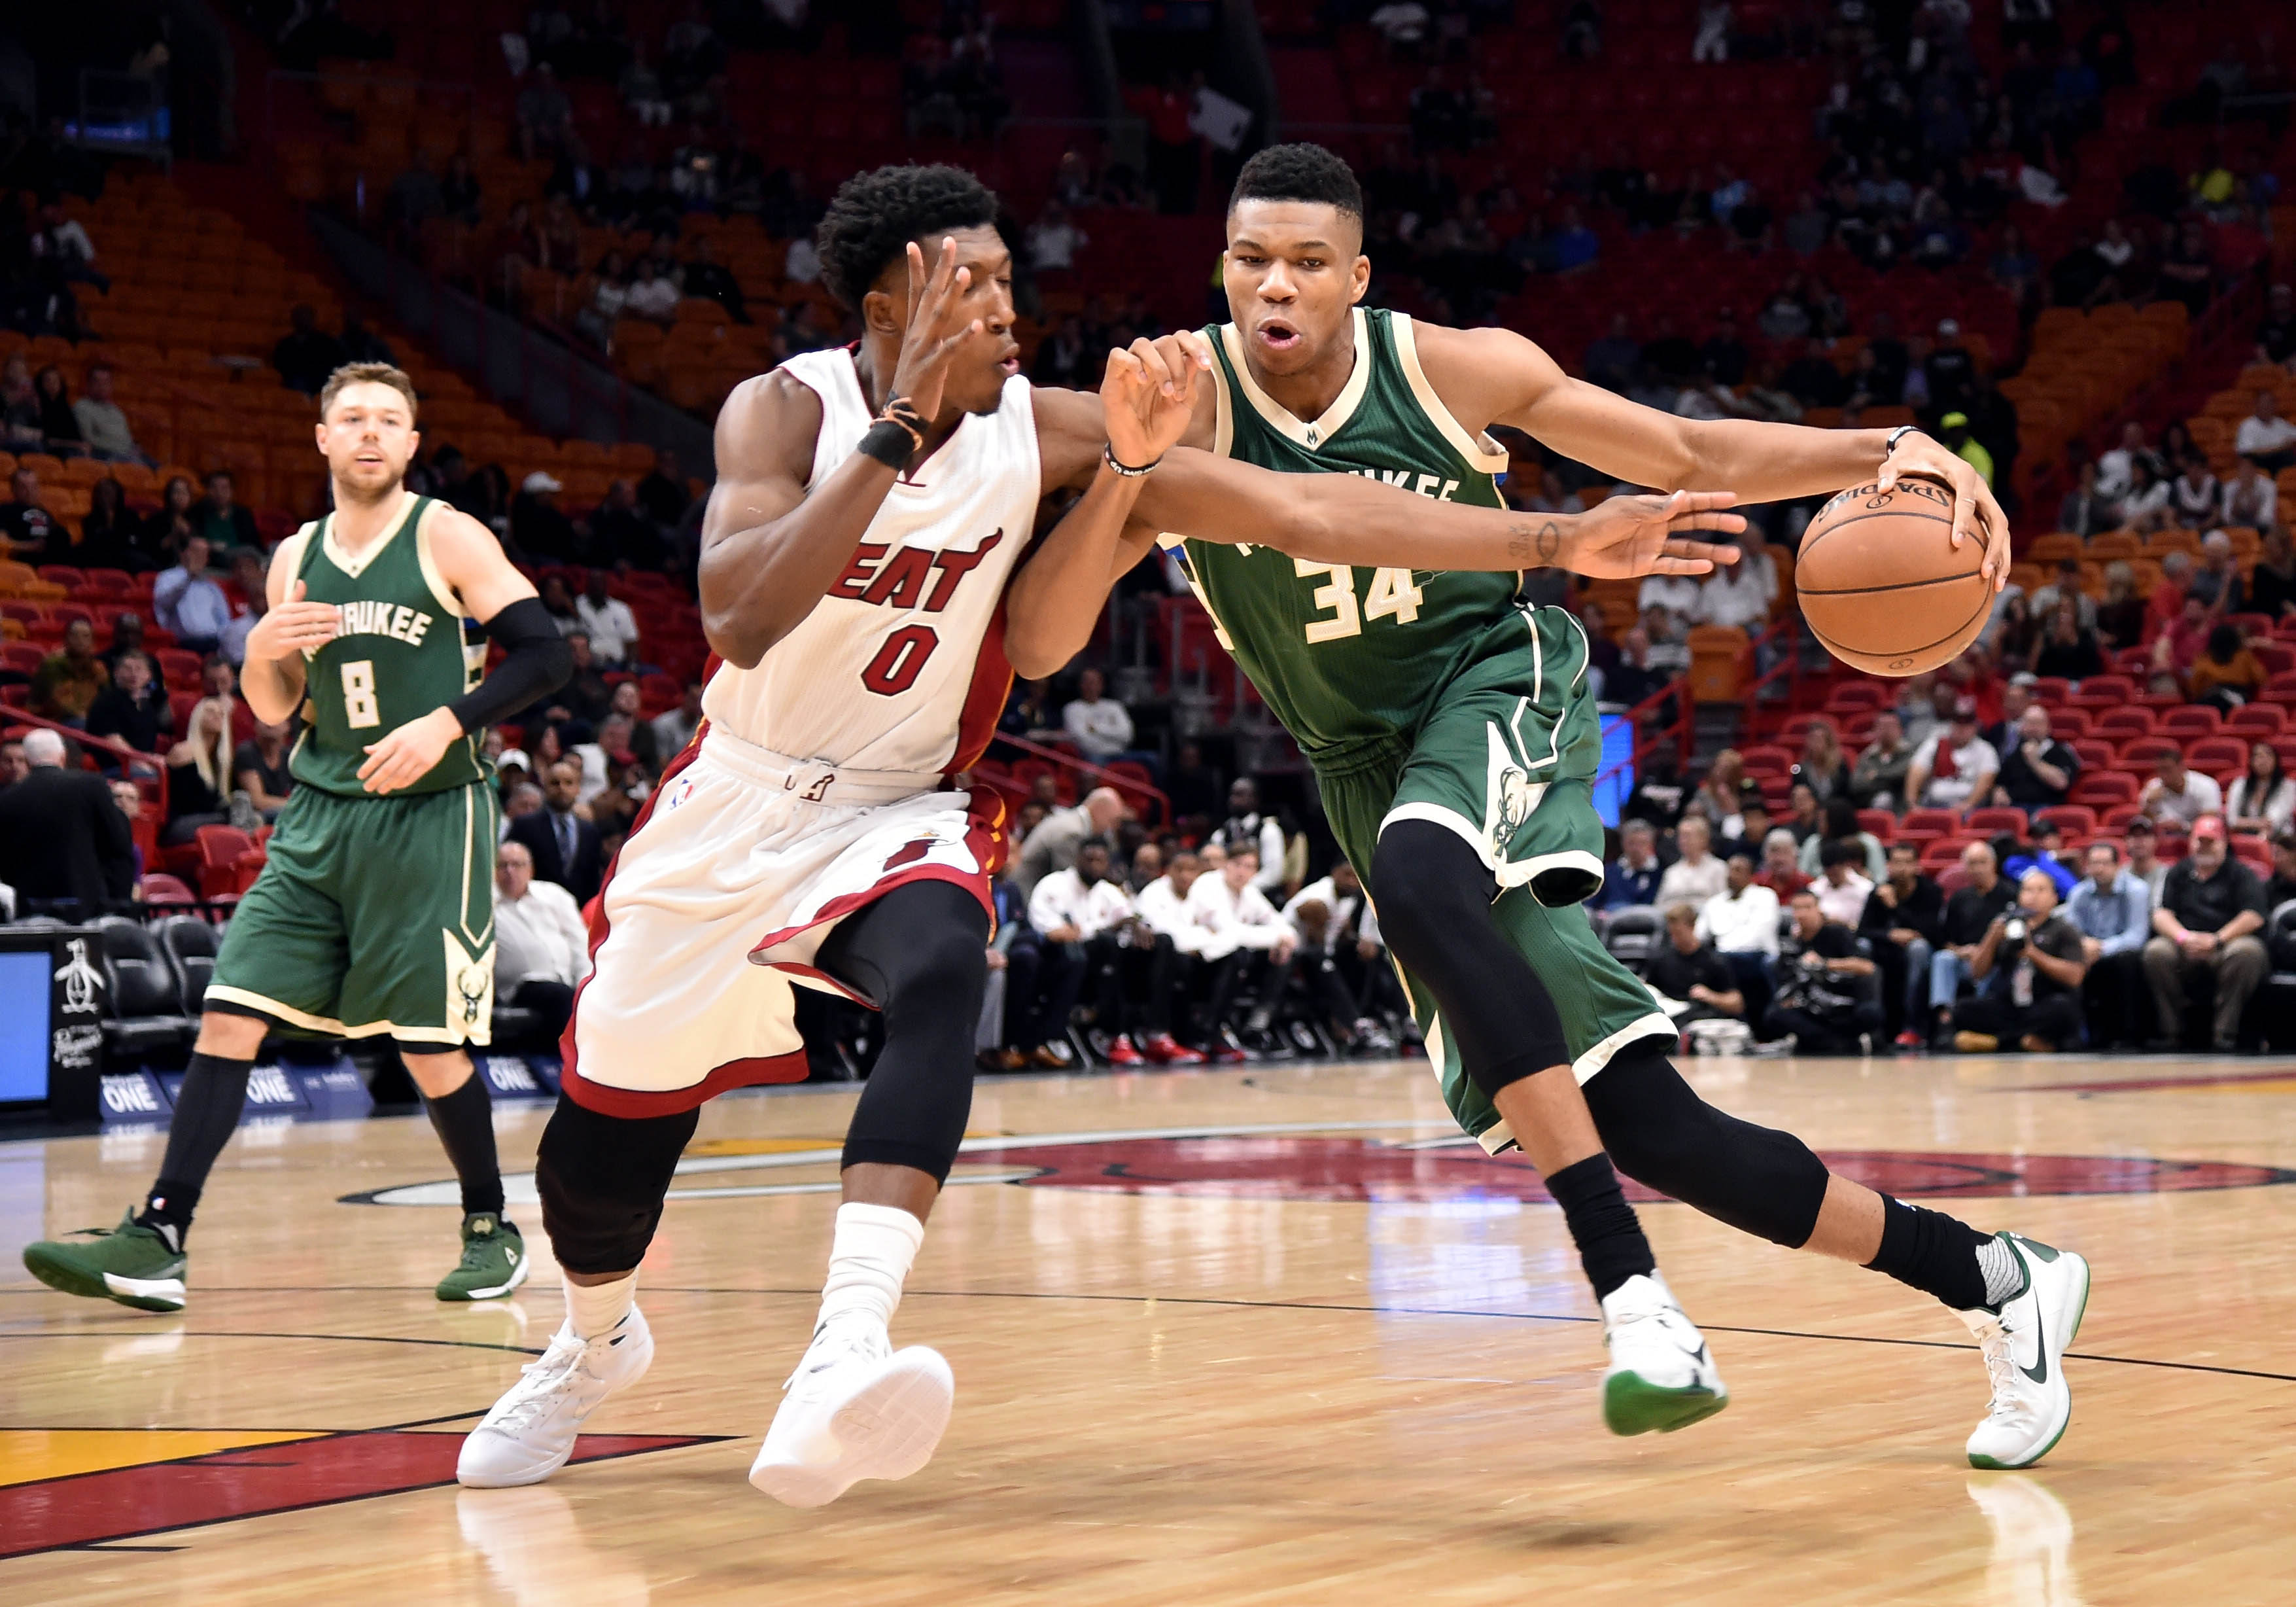 Nba Basketball Miami Heat Bedroom In: Milwaukee Bucks Game Preview: Jan. 13 Vs Miami Heat